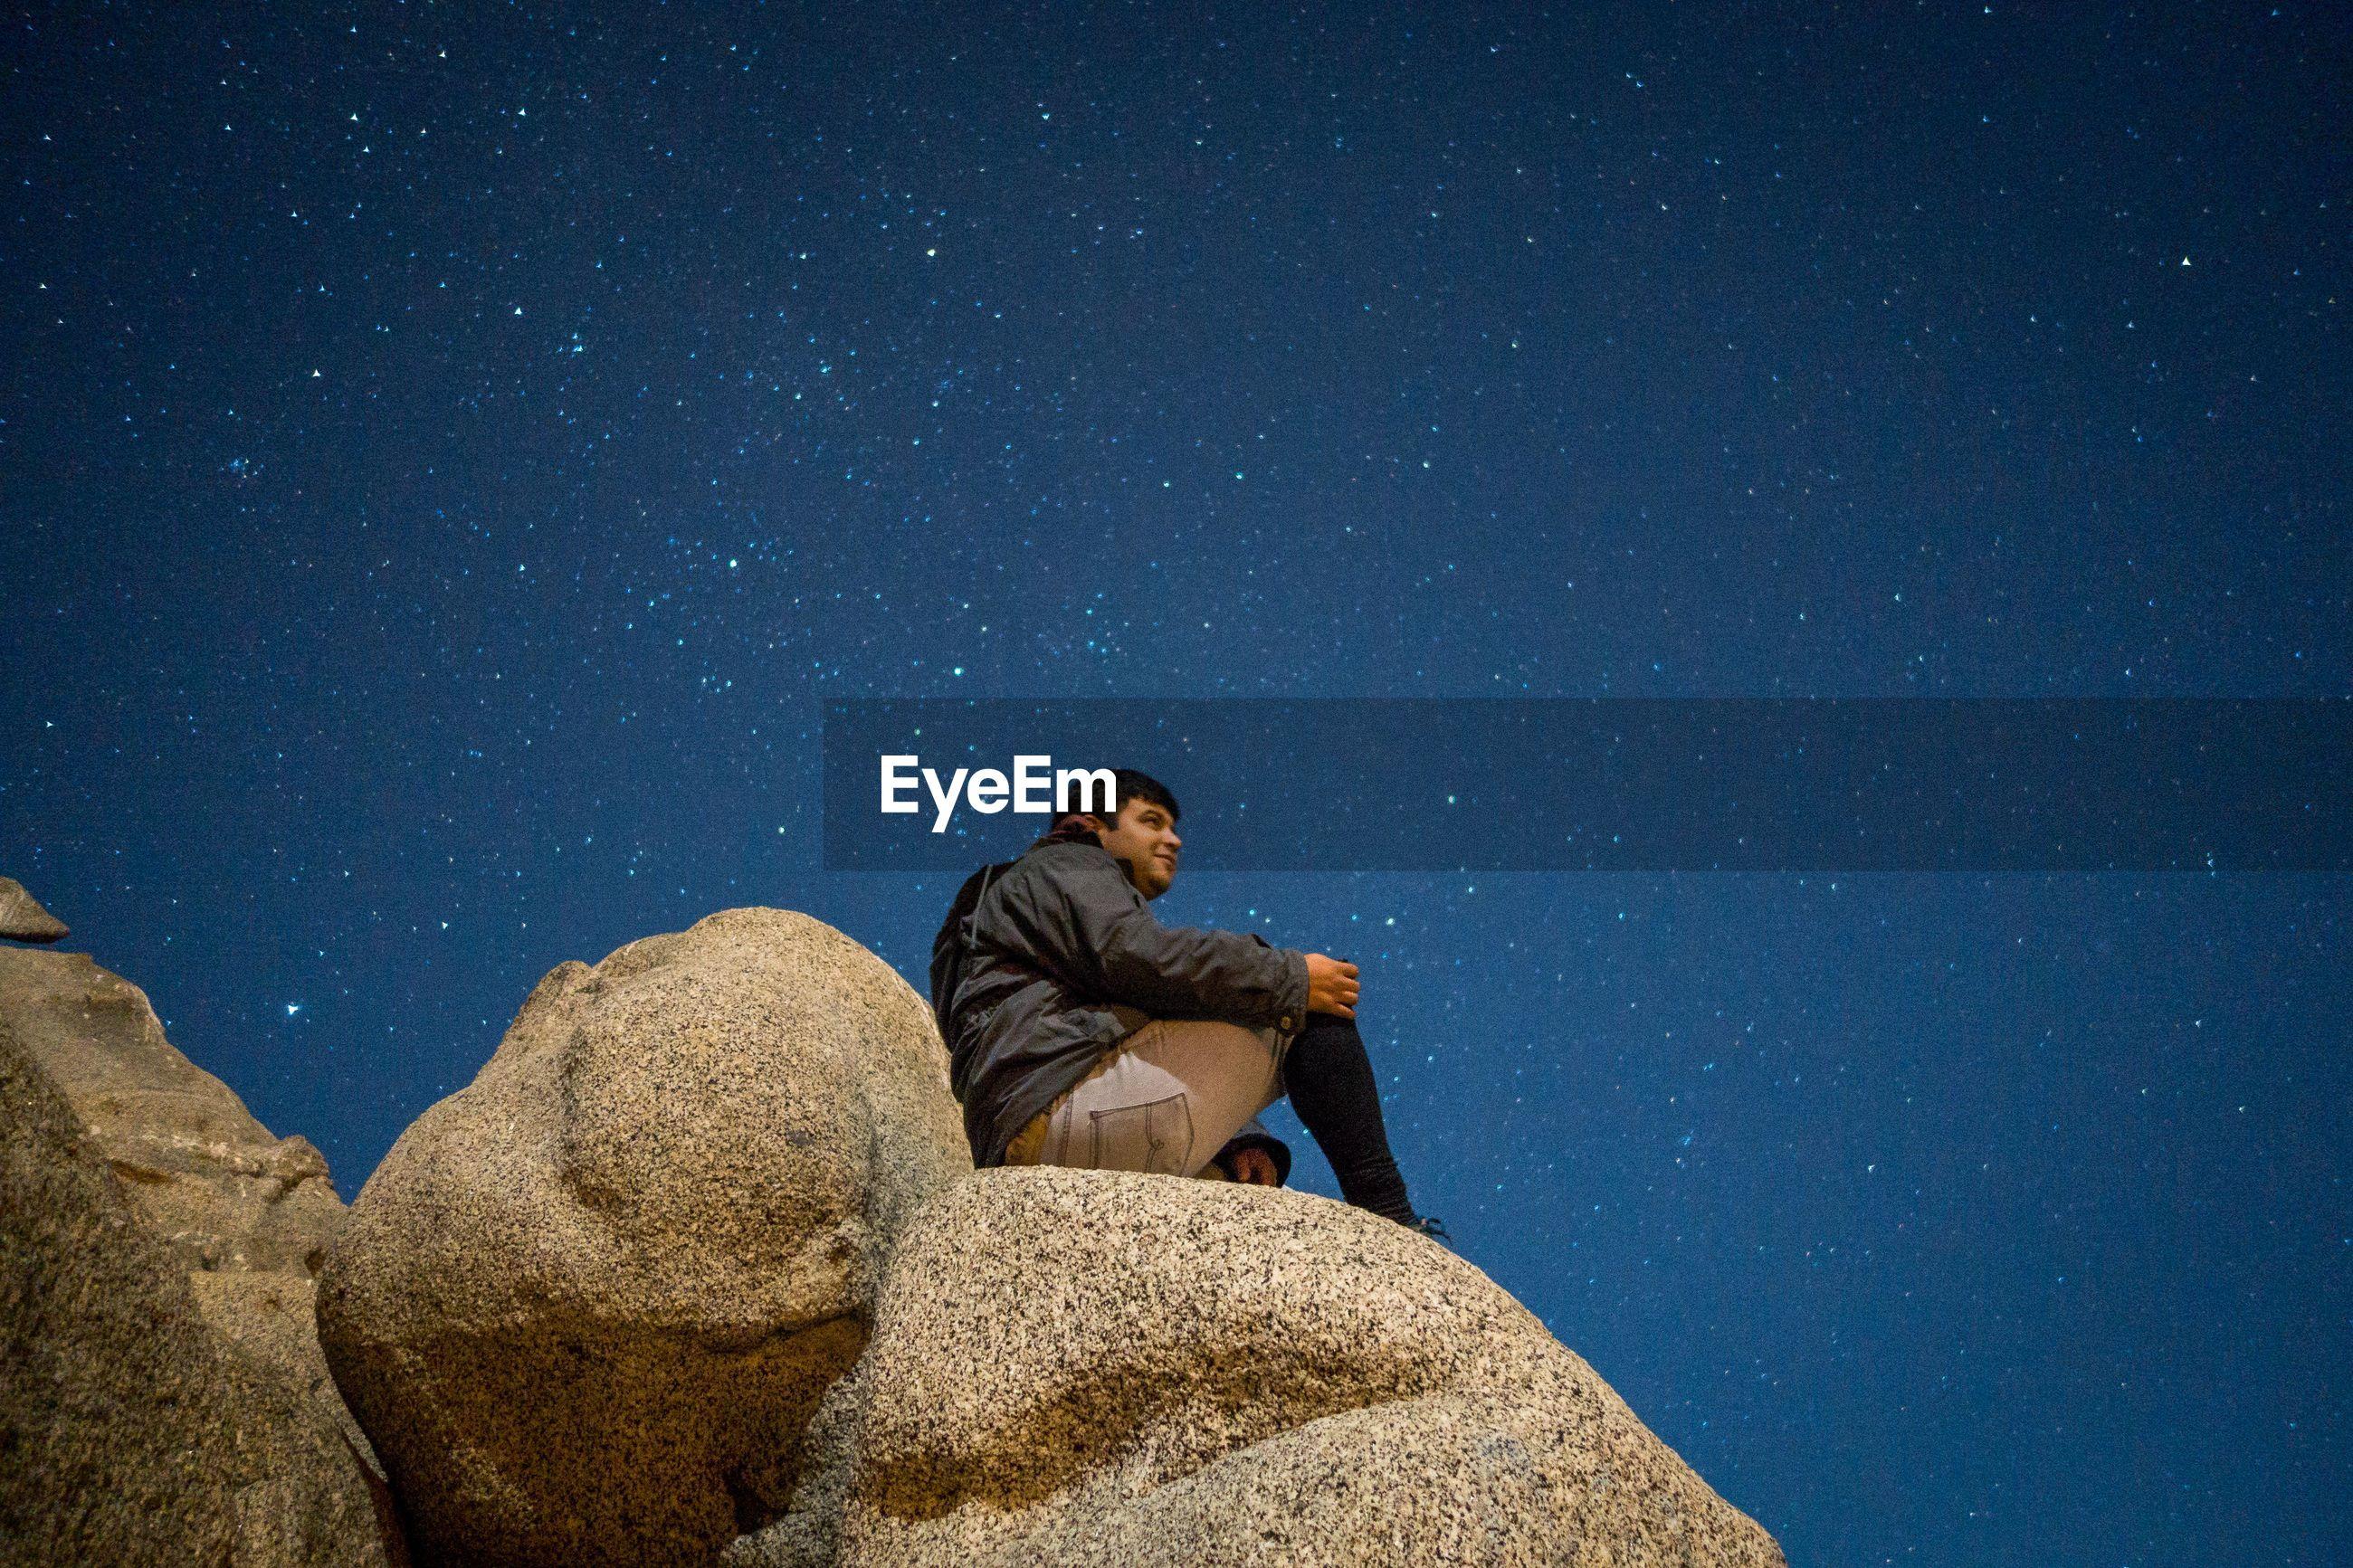 Man on rock formation at night